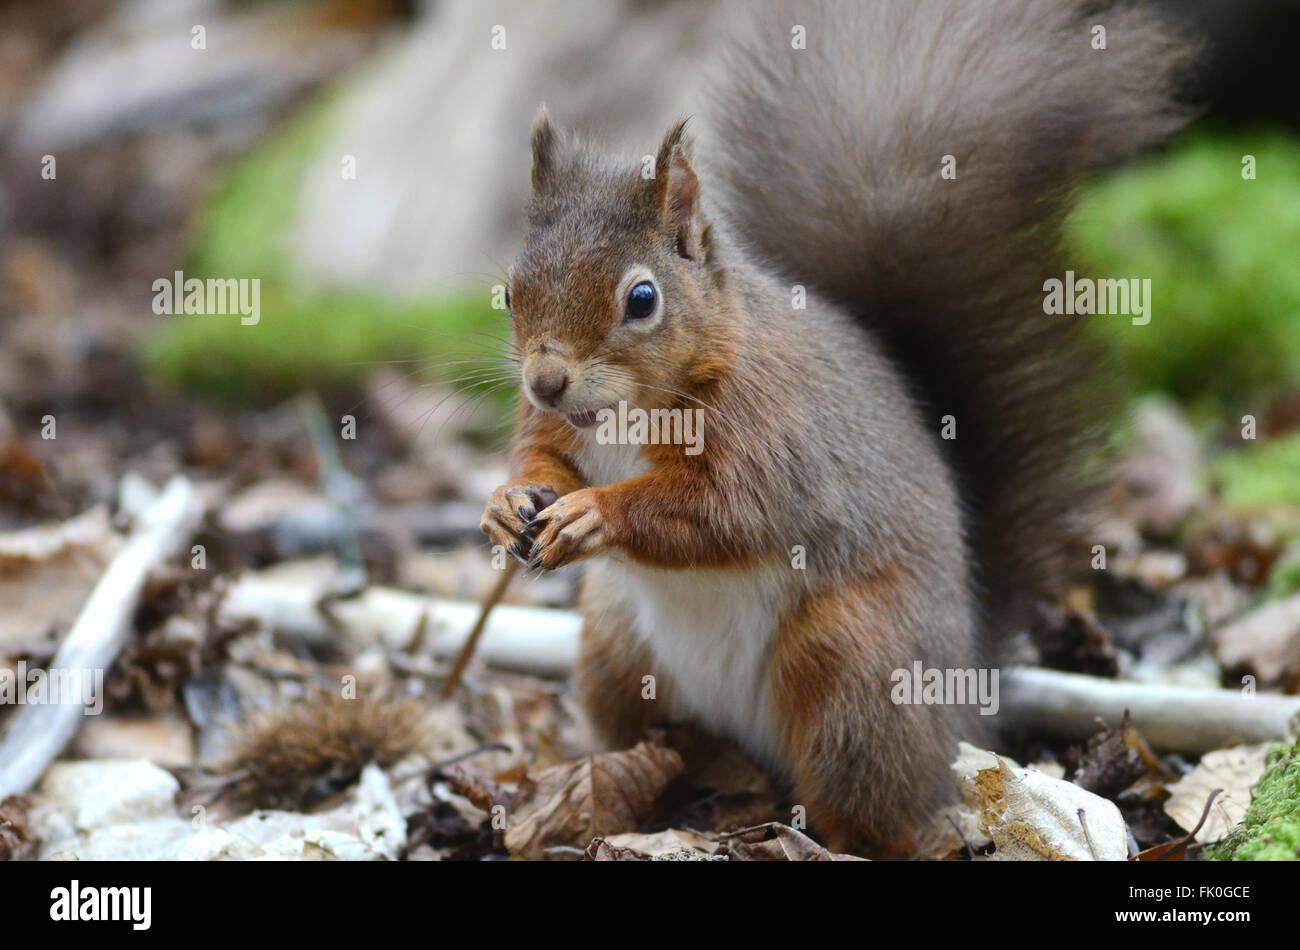 Red squirrel. Brownsea Island, Dorset, UK February 2014 - Stock Image